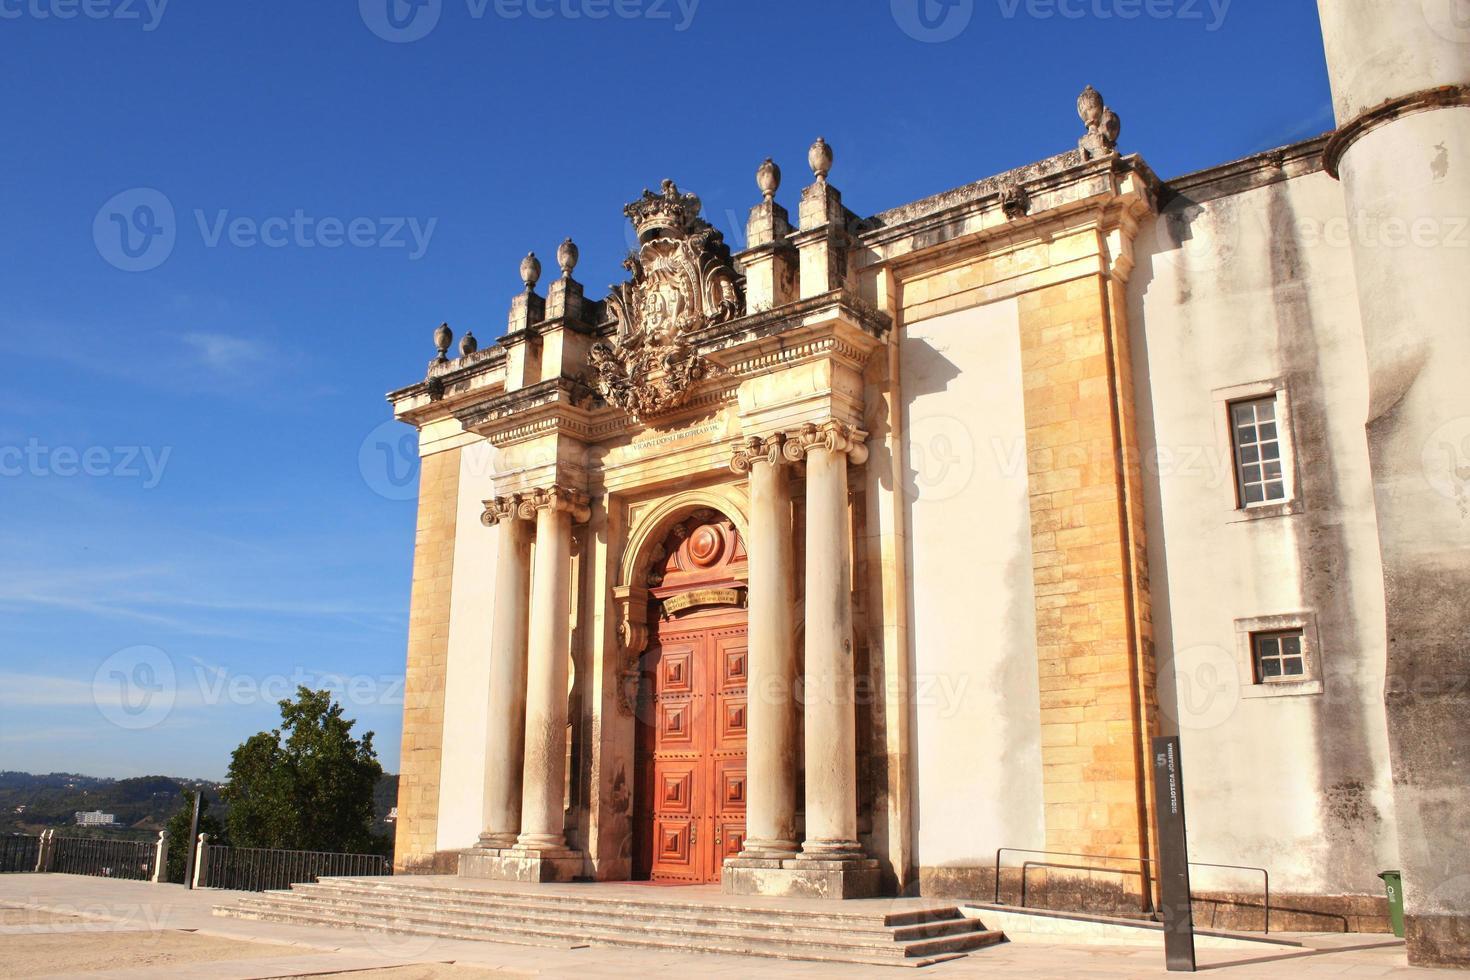 ingang van Joanina-bibliotheek, Universiteit van Coimbra, Portugal foto